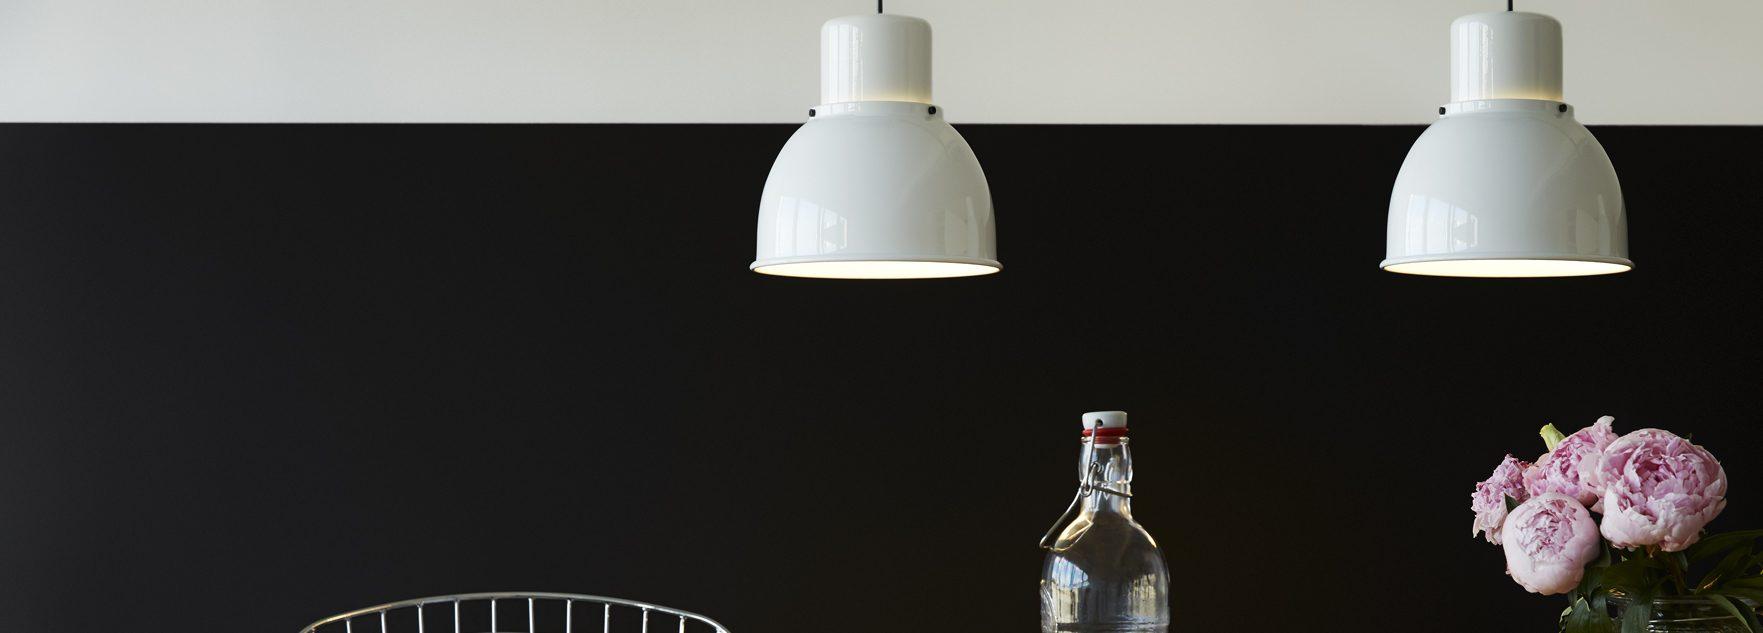 lampy-wiszace-reflex-tar-ideal-design